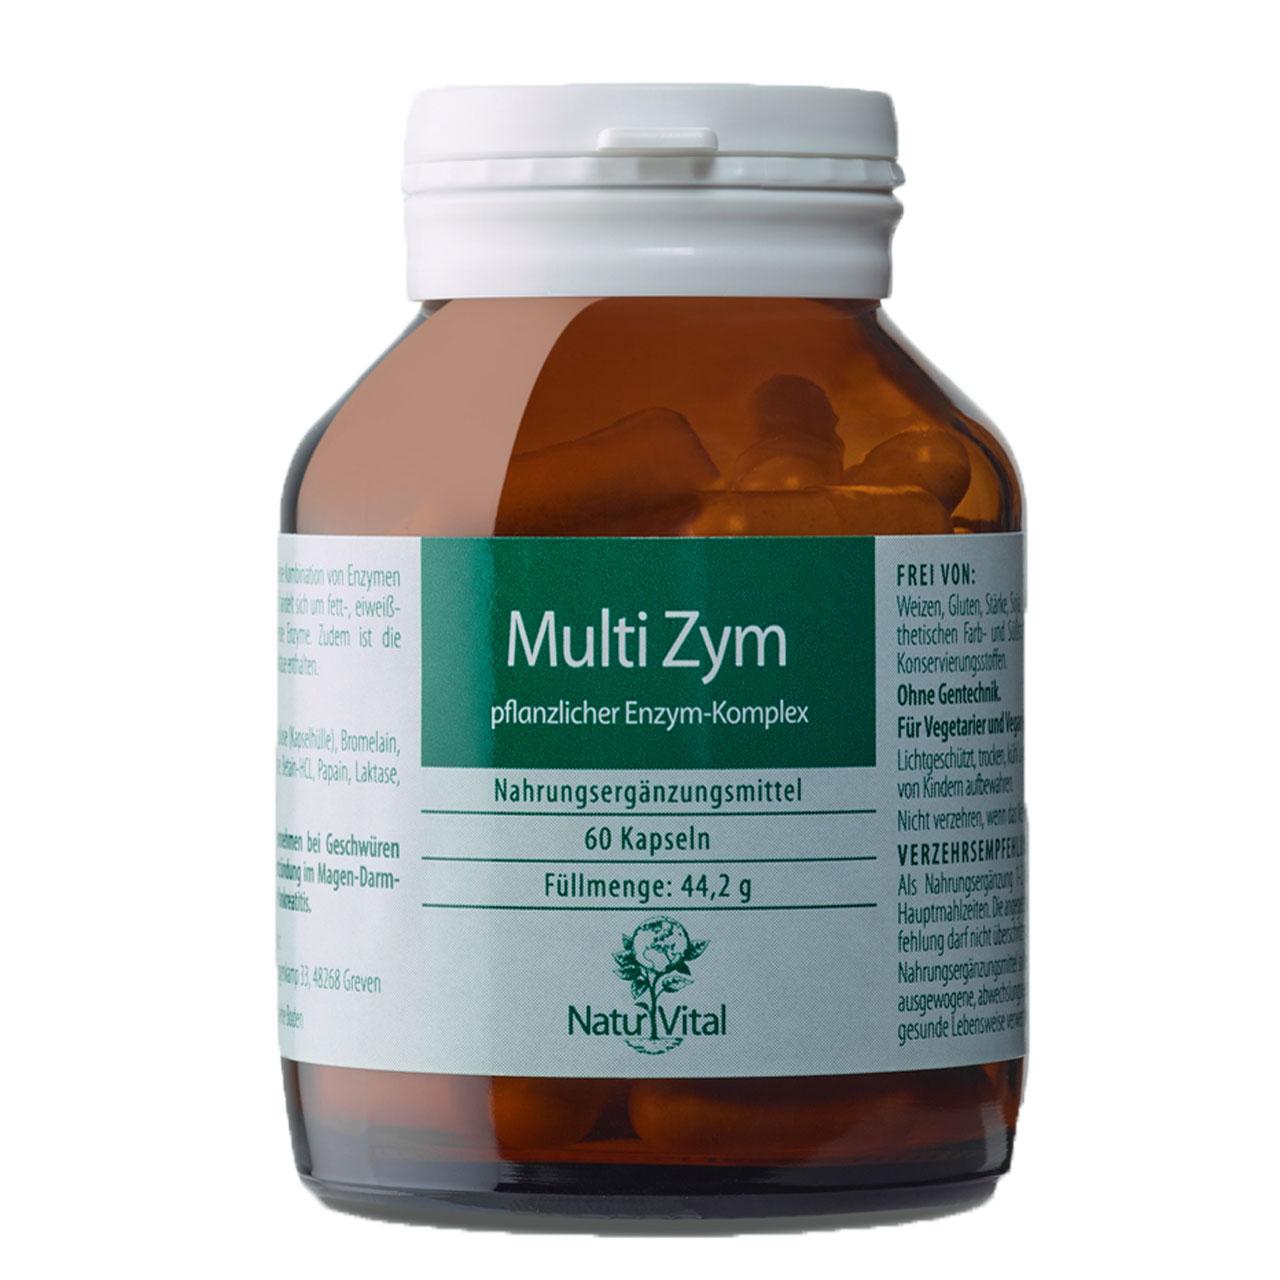 MultiZym Verdauungsenzyme, 60 Kapseln